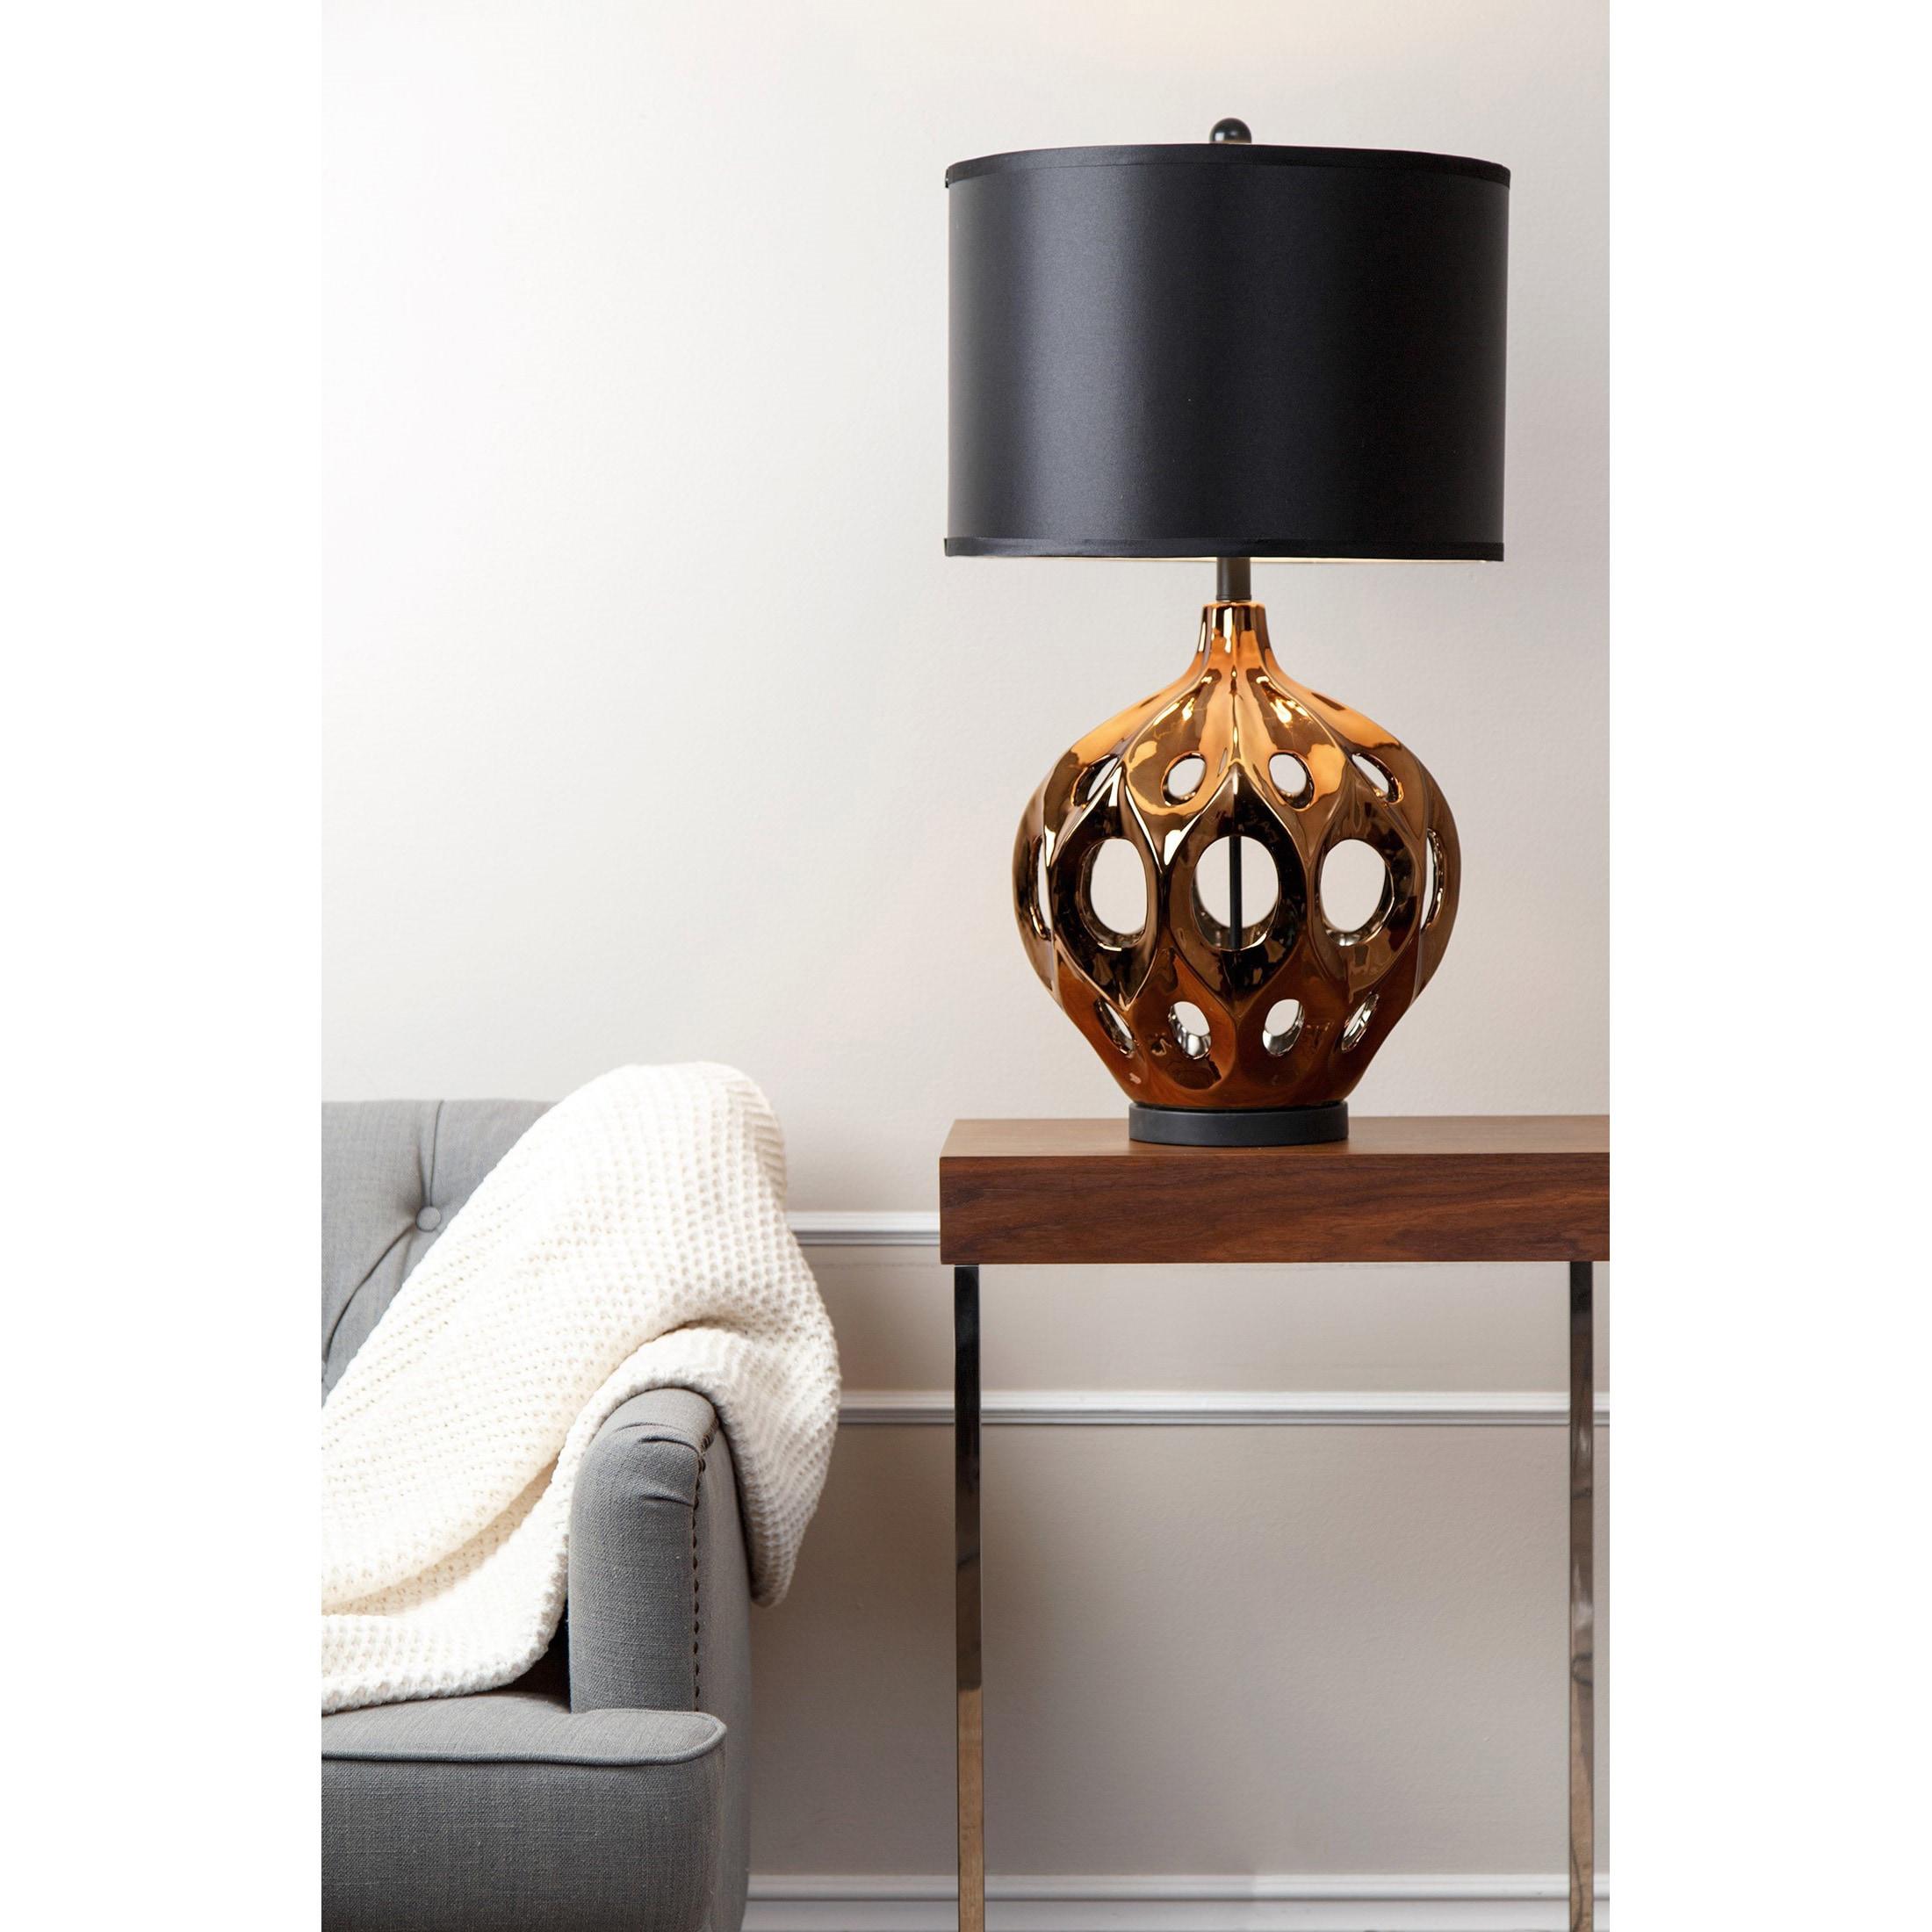 Abbyson Eva Ceramic Large Table Lamp - Free Shipping Today ...